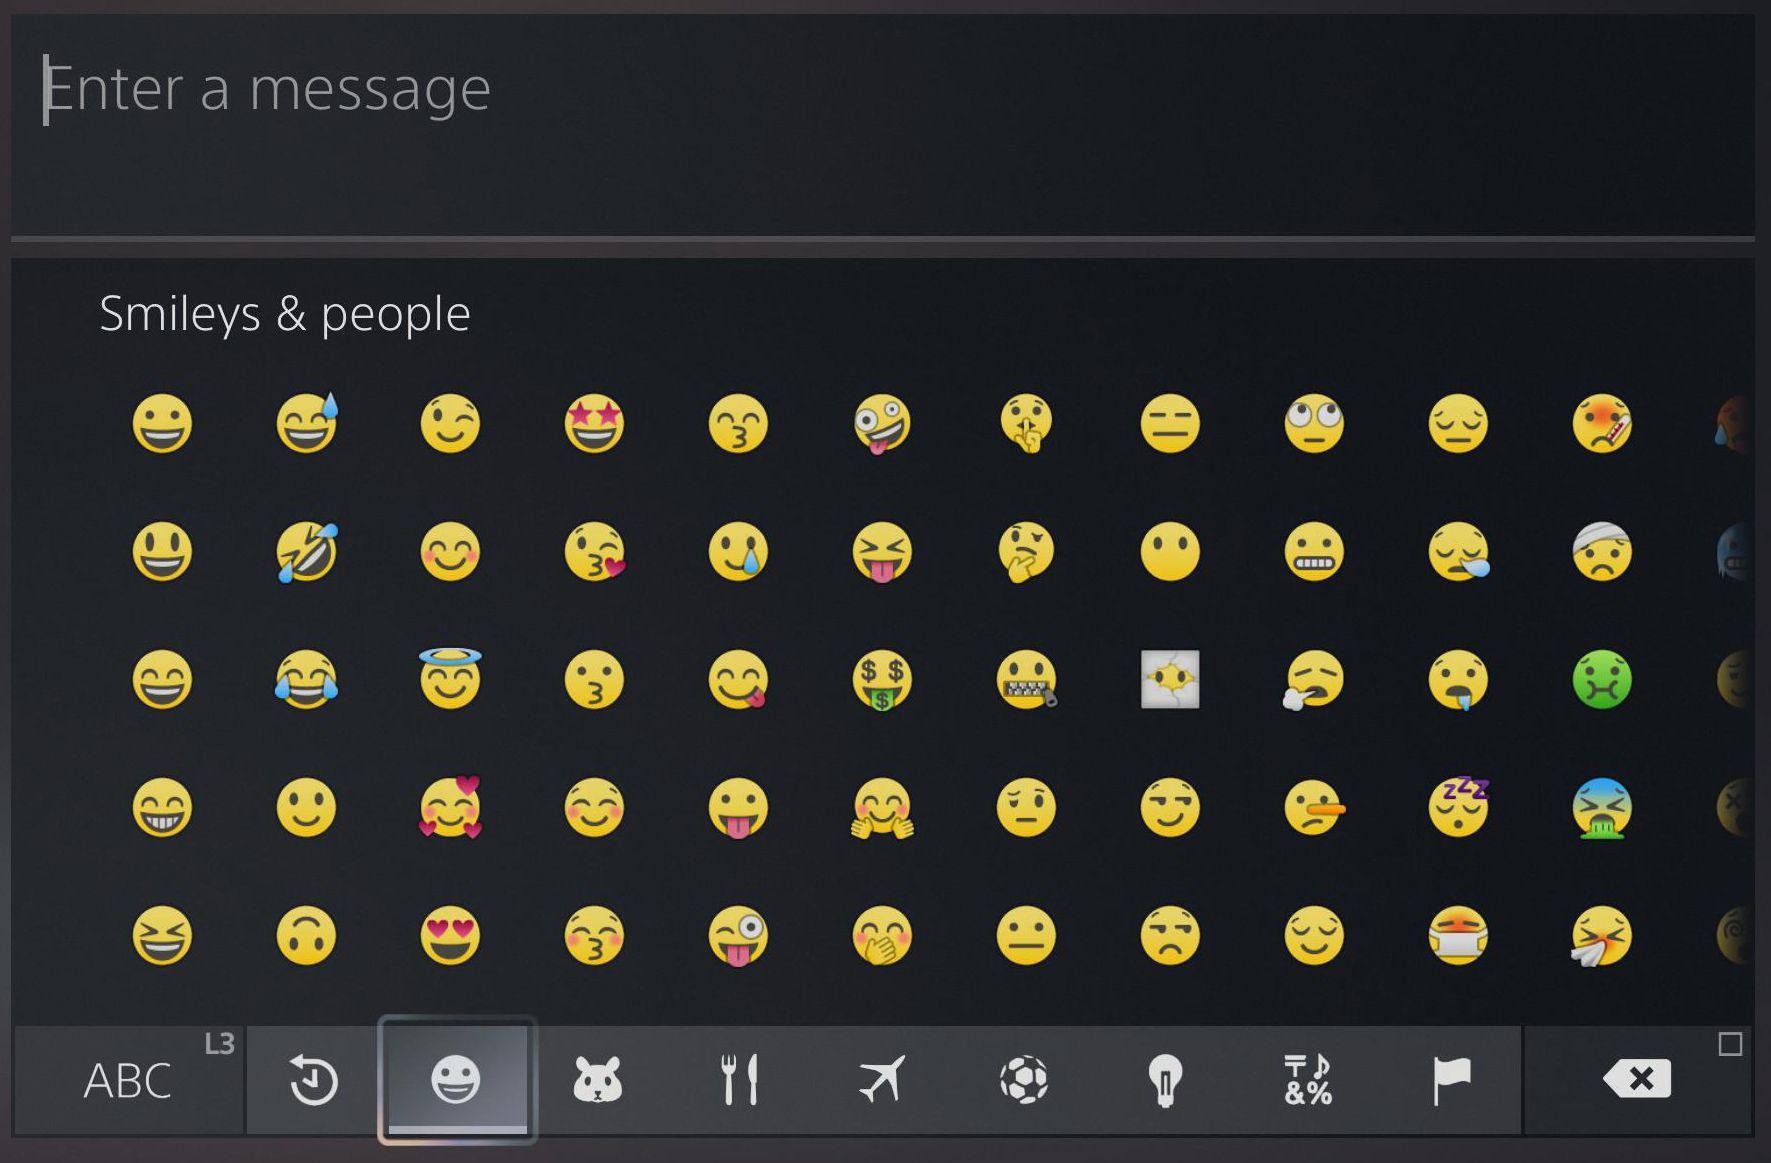 Emojipedia-Playstation-5-Messages-Emoji-Keyboard-2